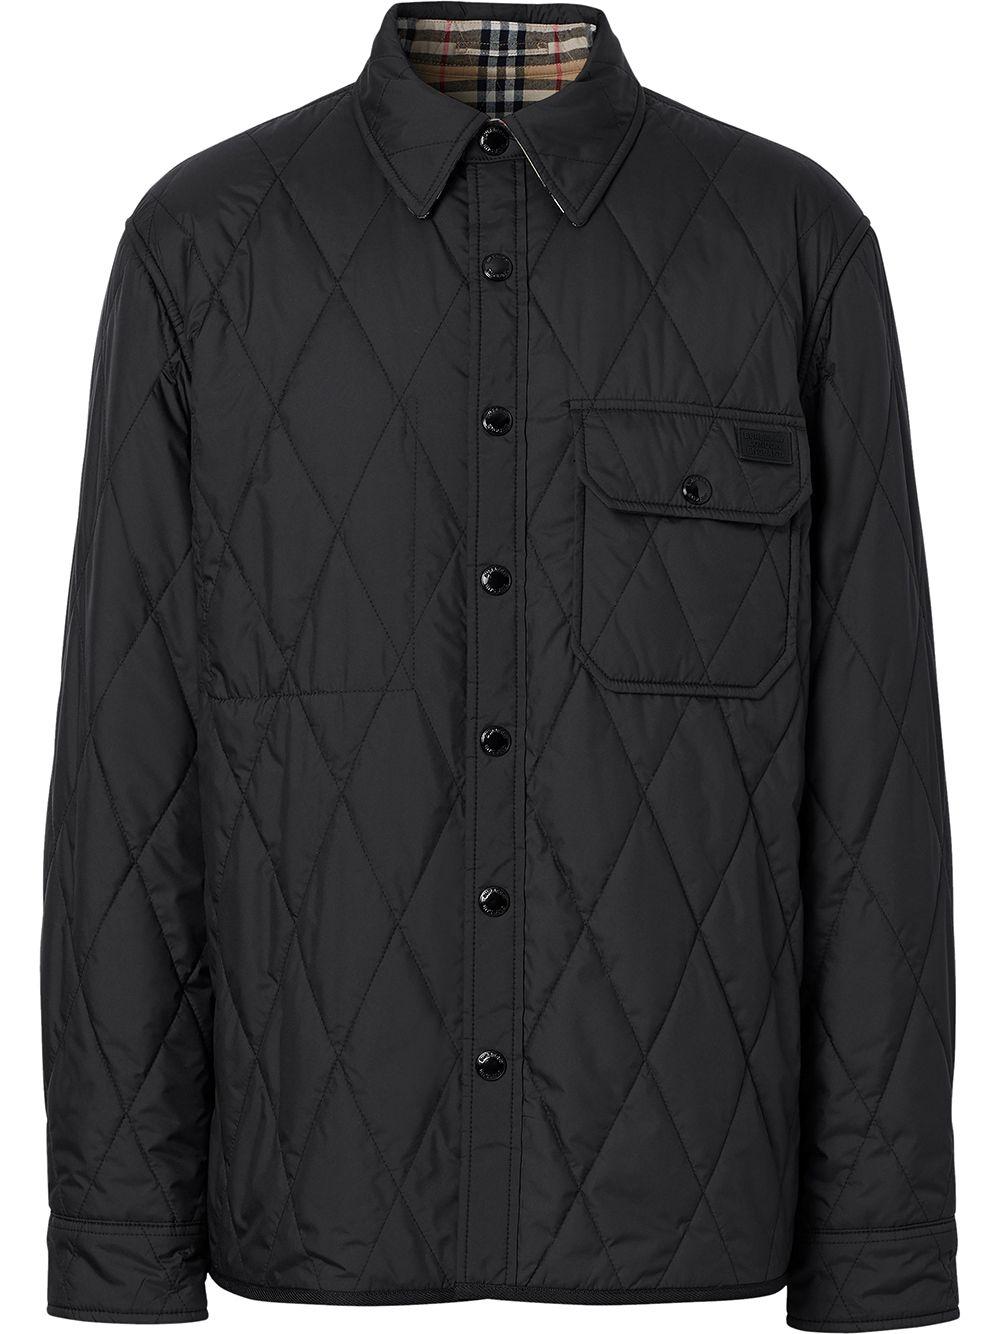 Cresswell Jacket